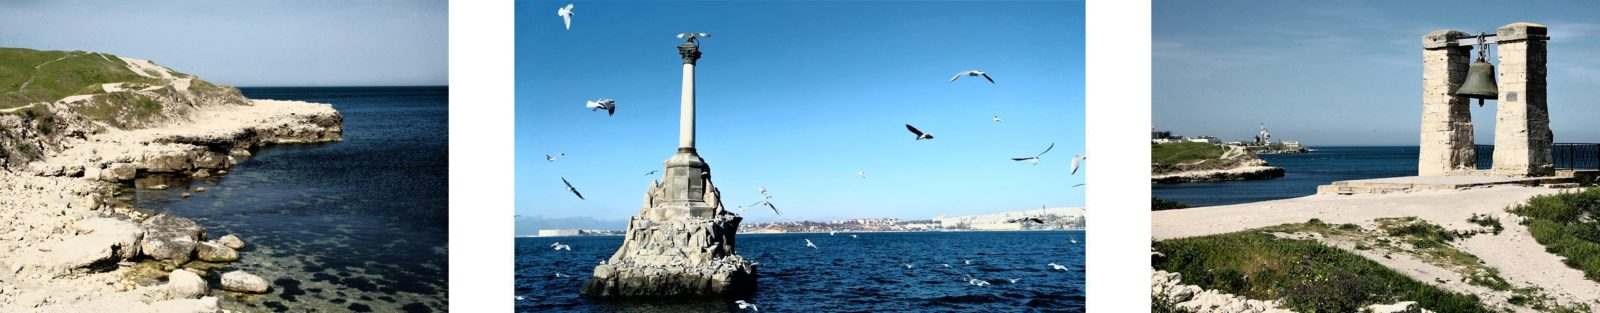 В Севастополе обсудили тенденции развития гостиничного бизнеса